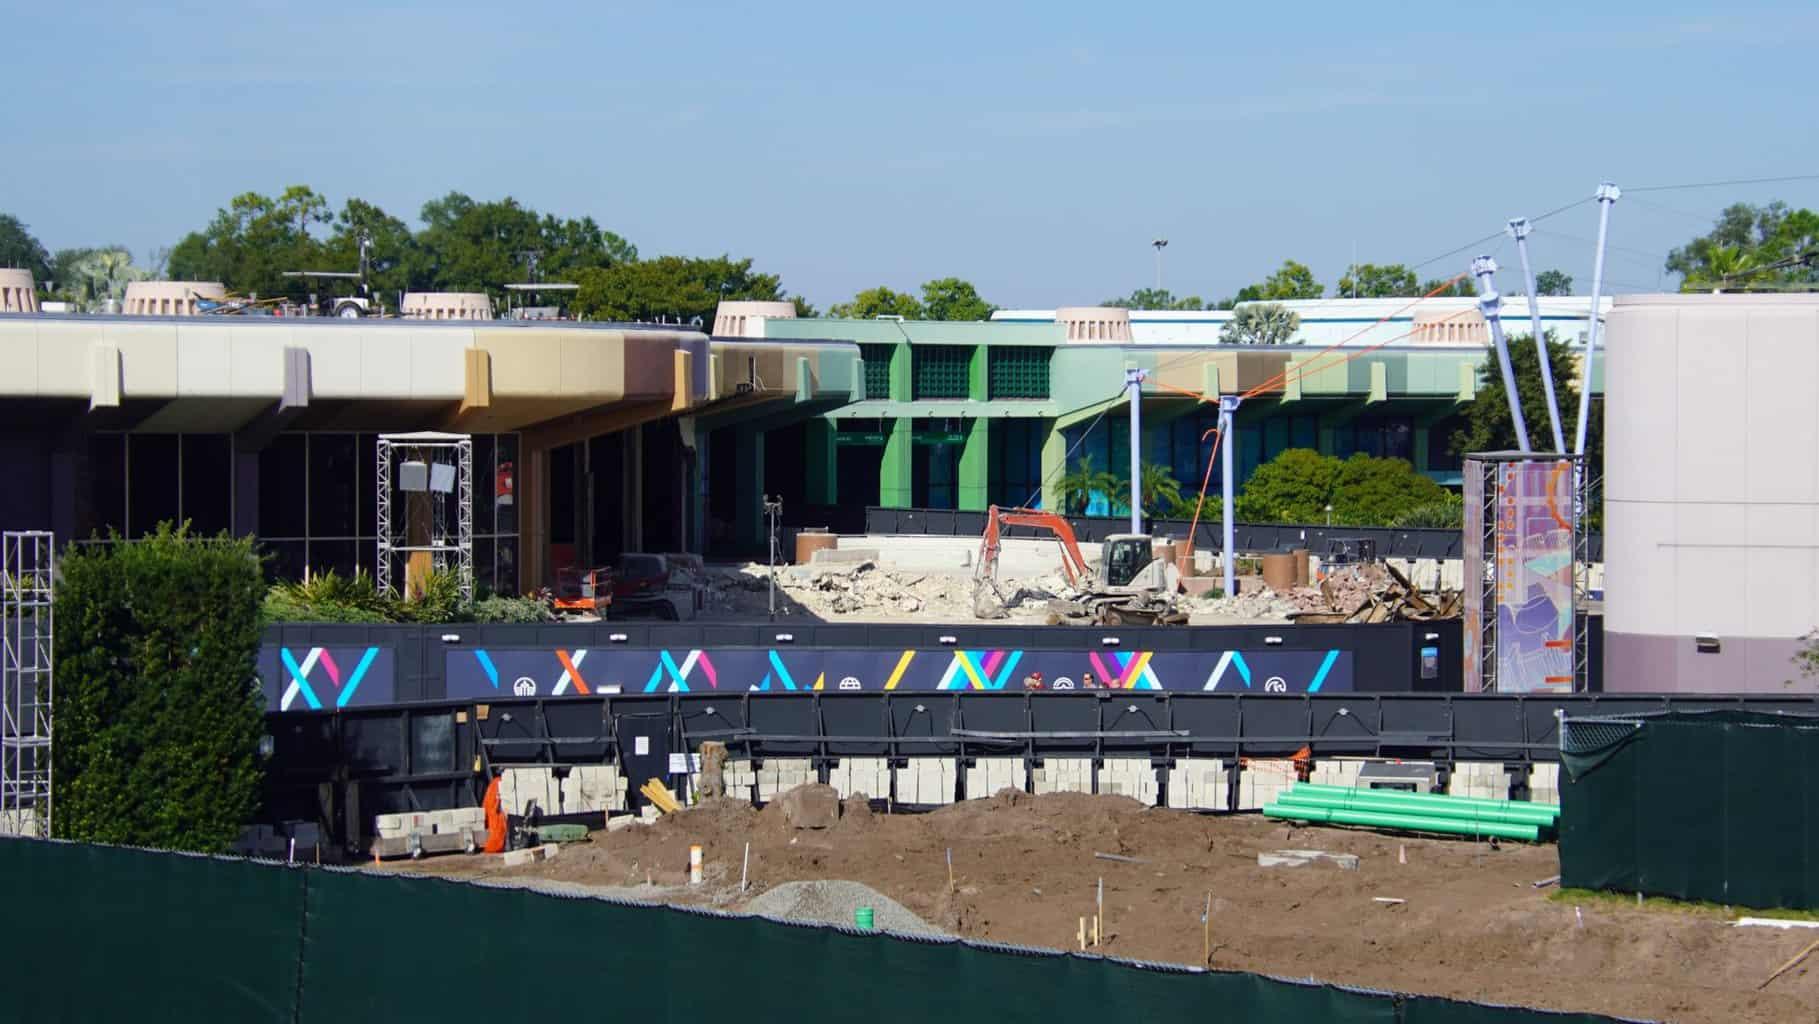 Starbucks demolition Epcot Construction Updates November 2019